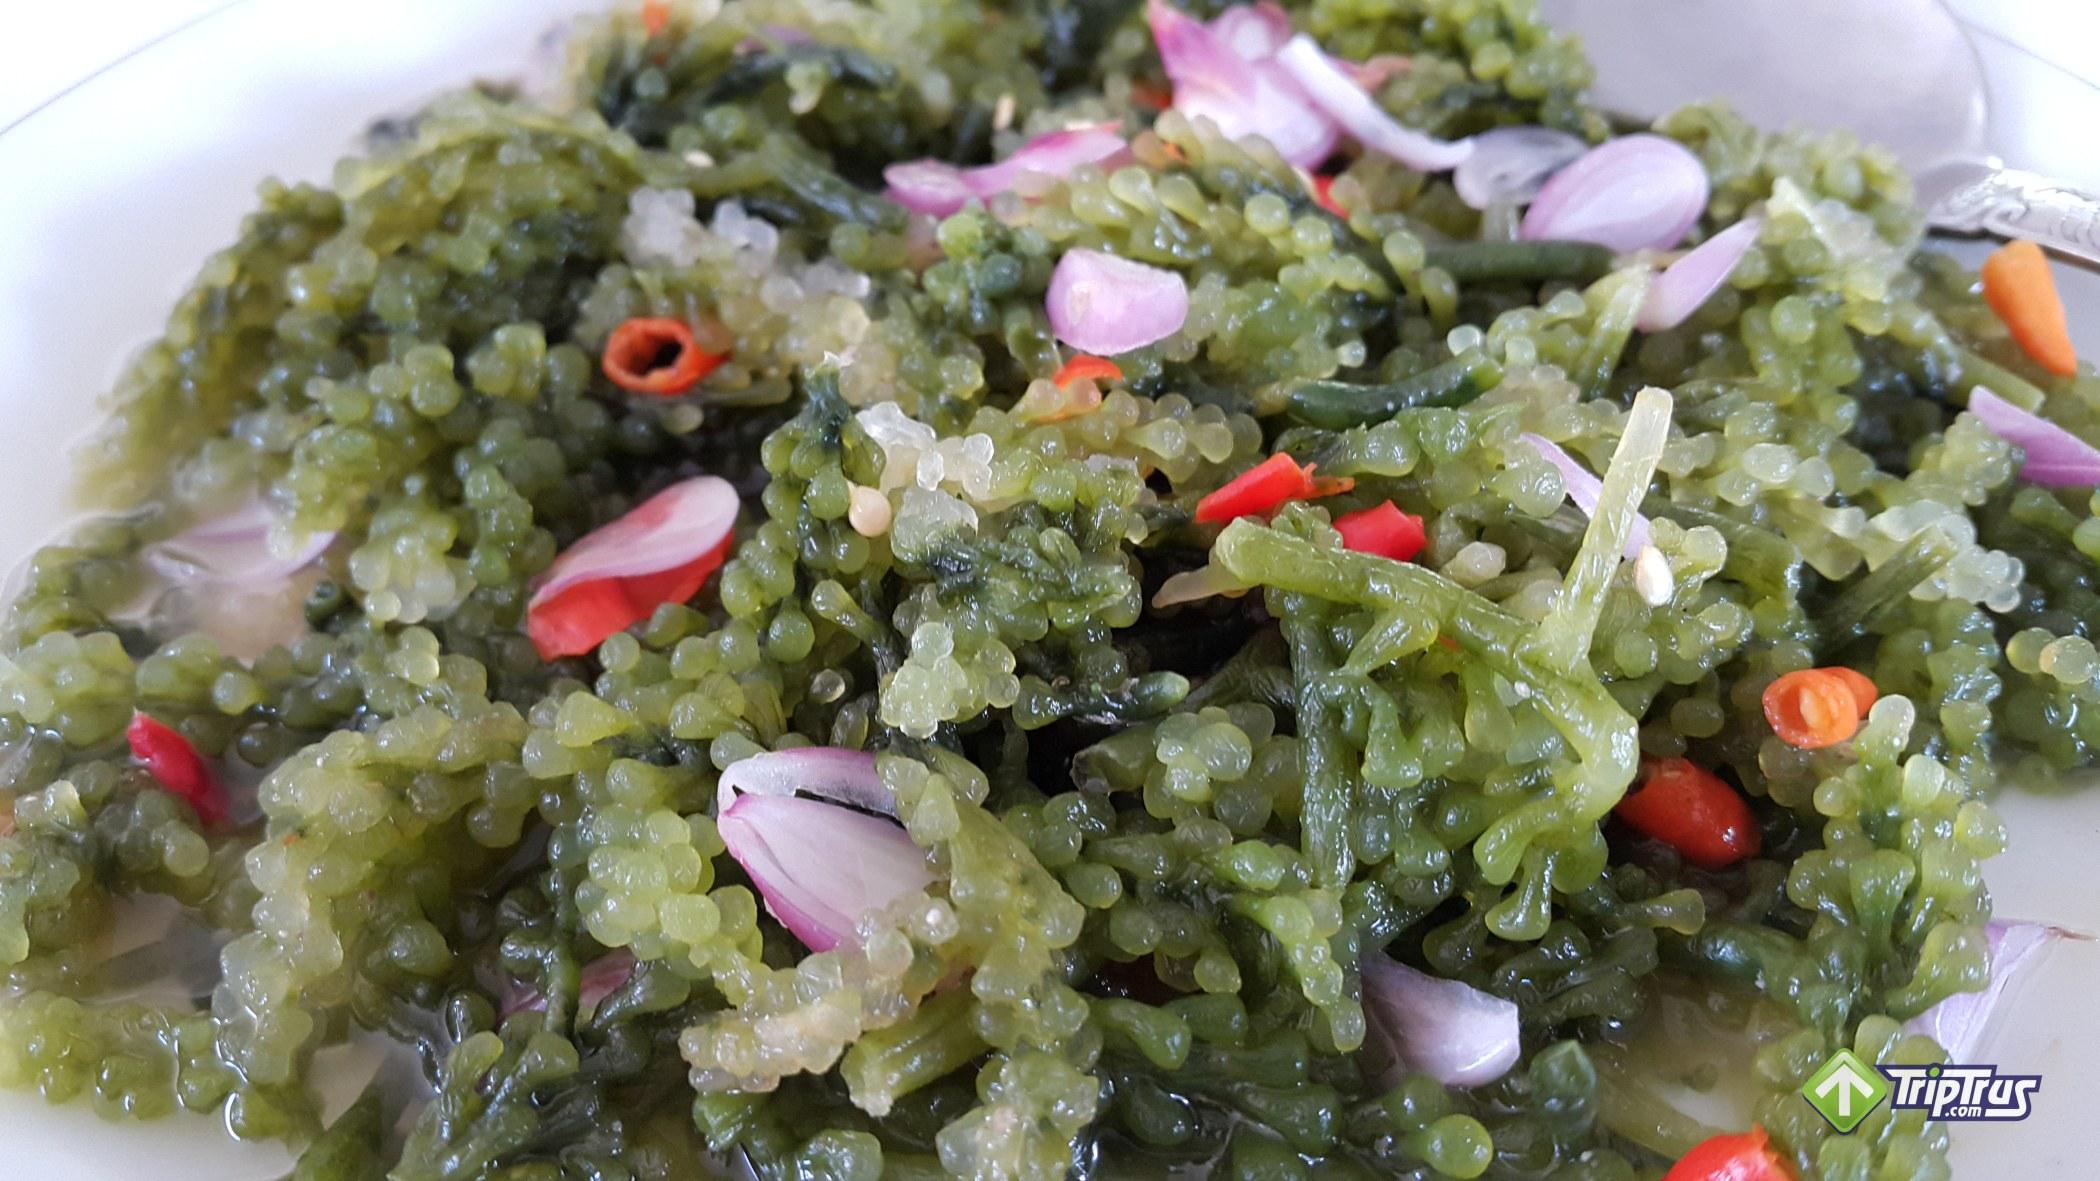 Lad, kuliner khas Kei dari rumput laut